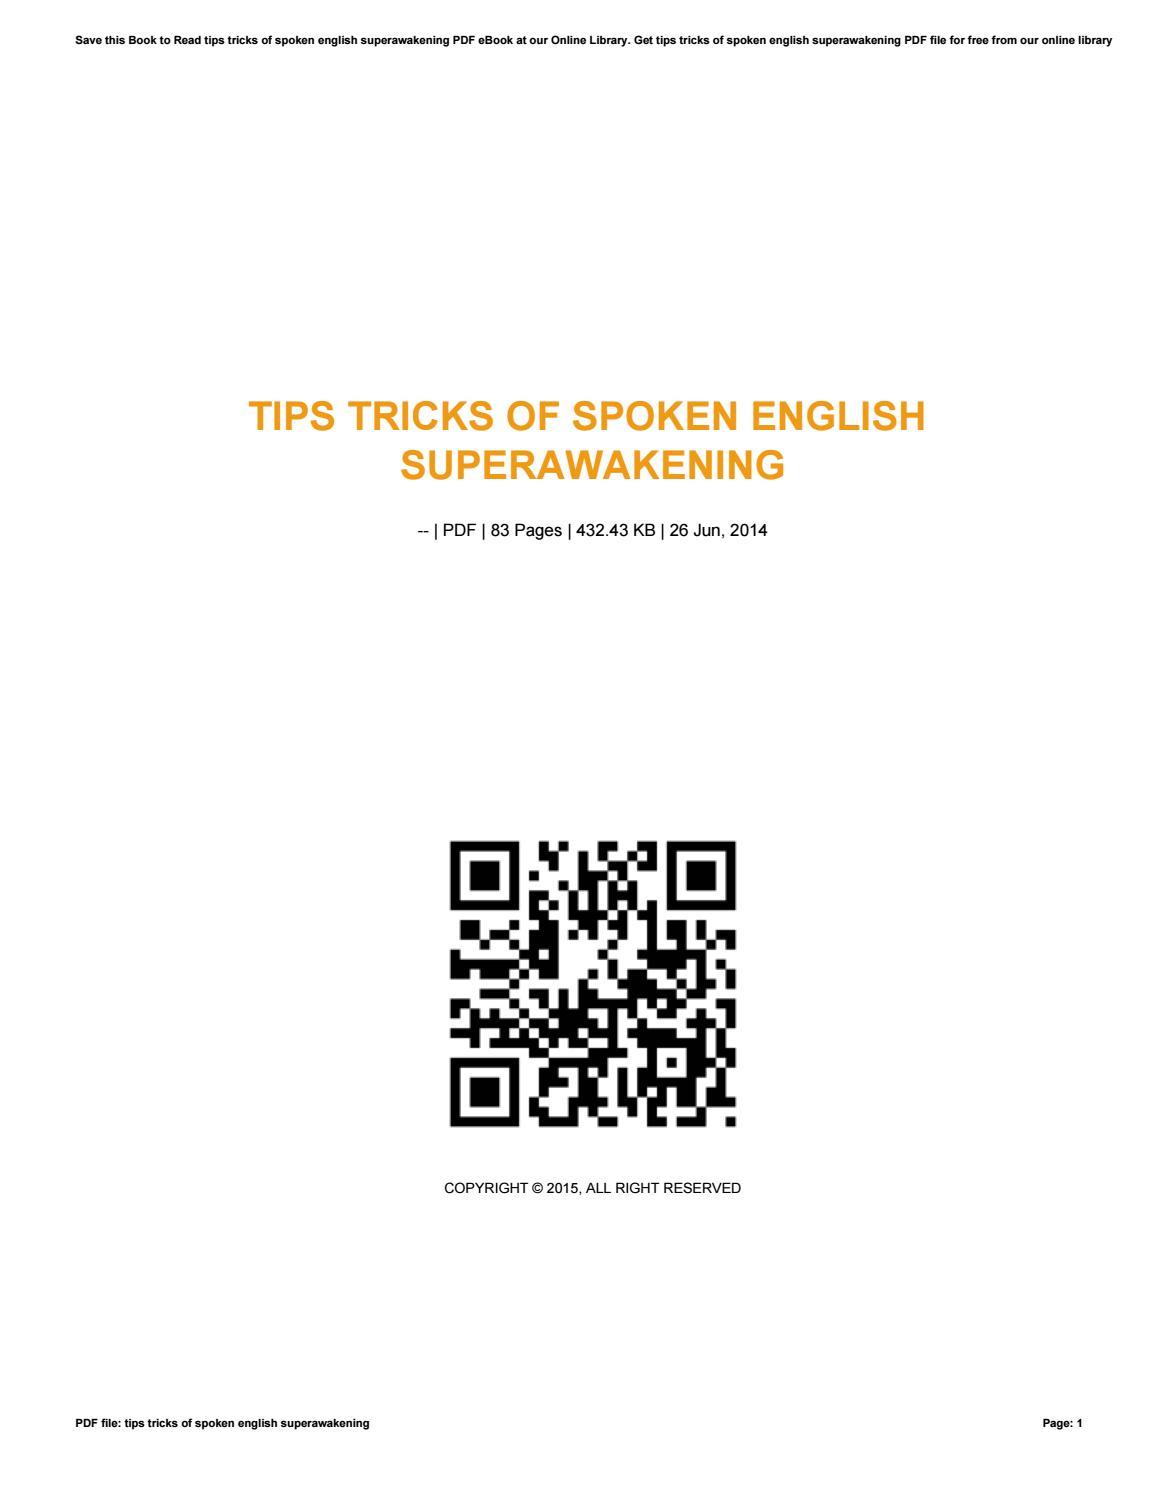 Spoken English Tutorial Ebook